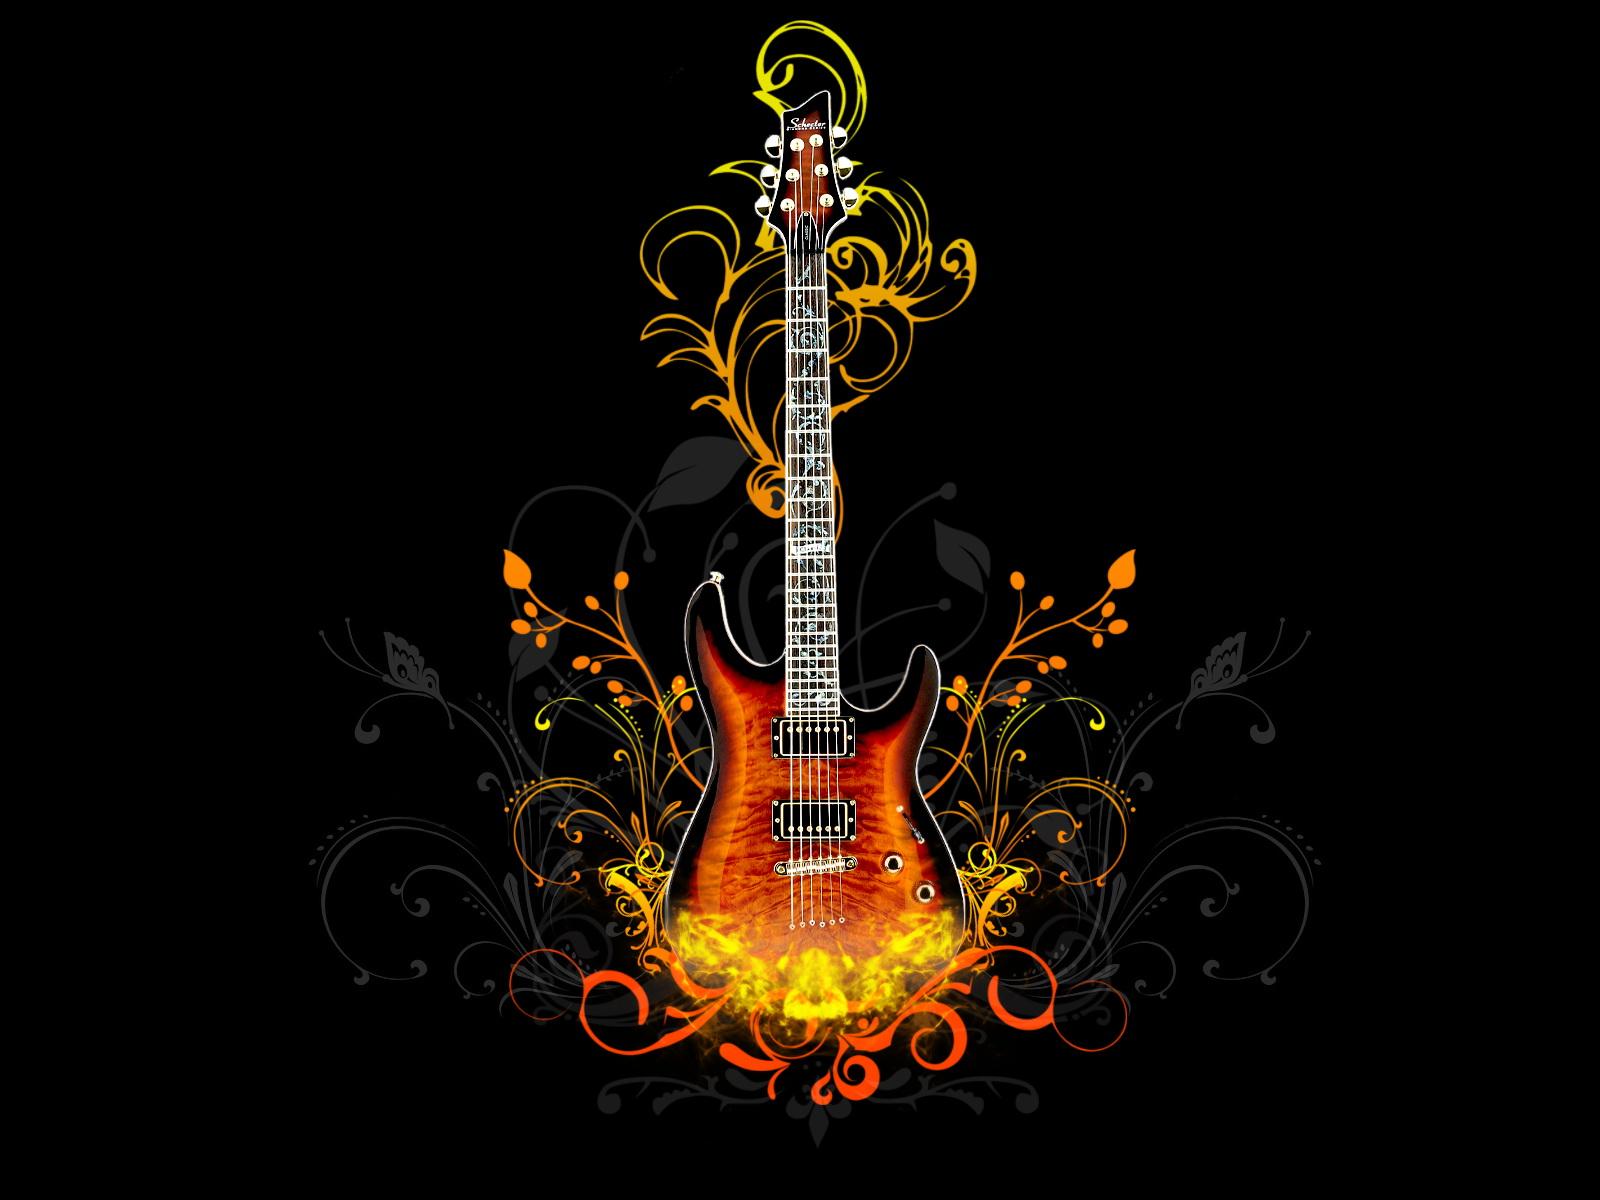 http://1.bp.blogspot.com/-EY3PLvJZ87s/TxVhBp1nY5I/AAAAAAAAFbM/r0vkInzK2Wo/s1600/Guitar-HD-Wallpaper-36.jpg